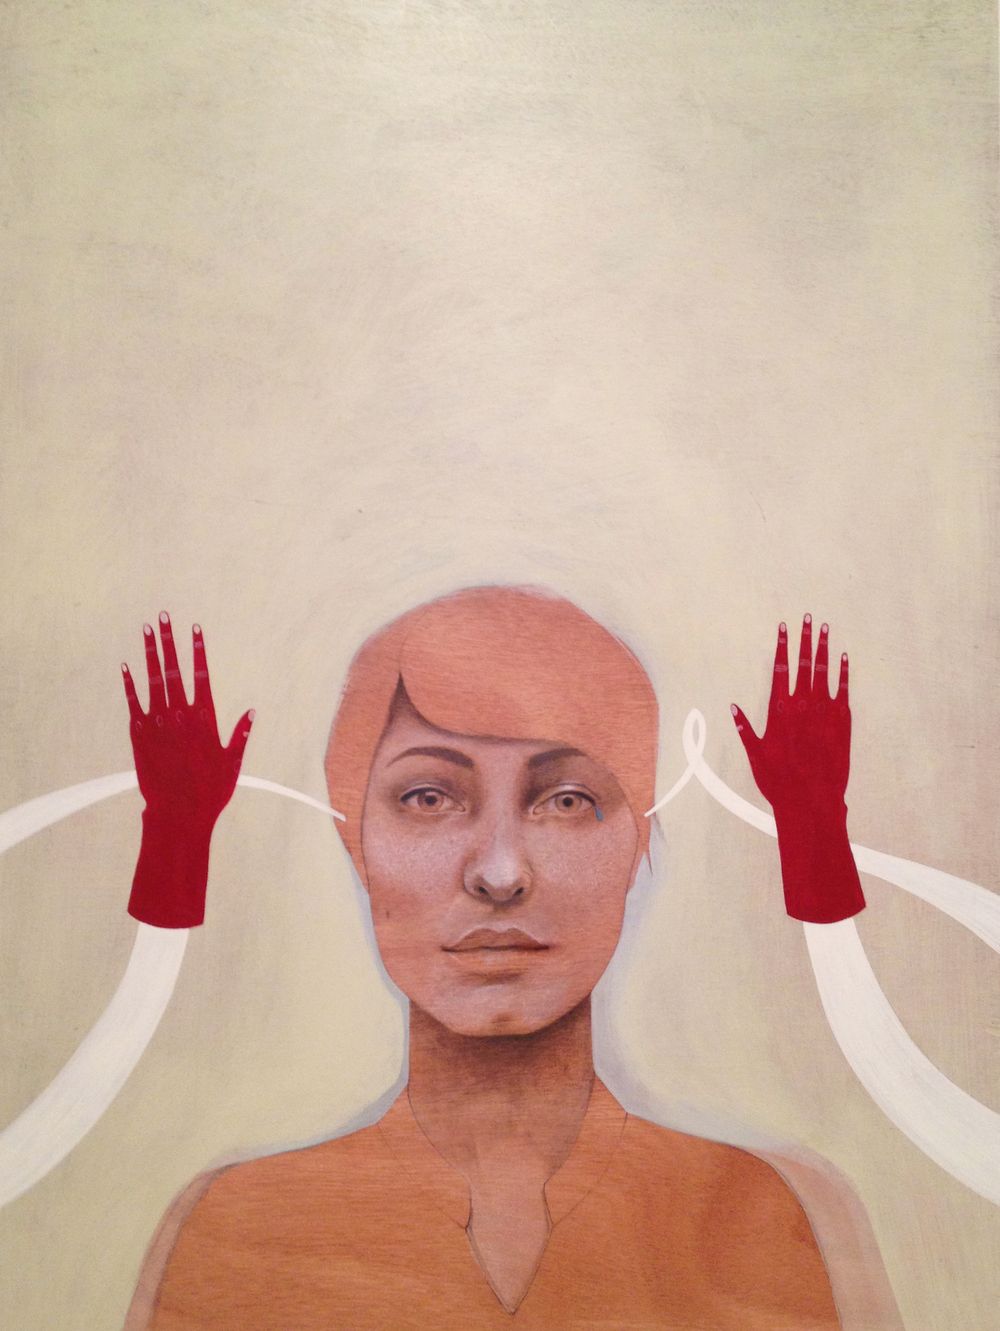 Self Portrait #2  |  graphite + acrylic on wood panel  |  2013